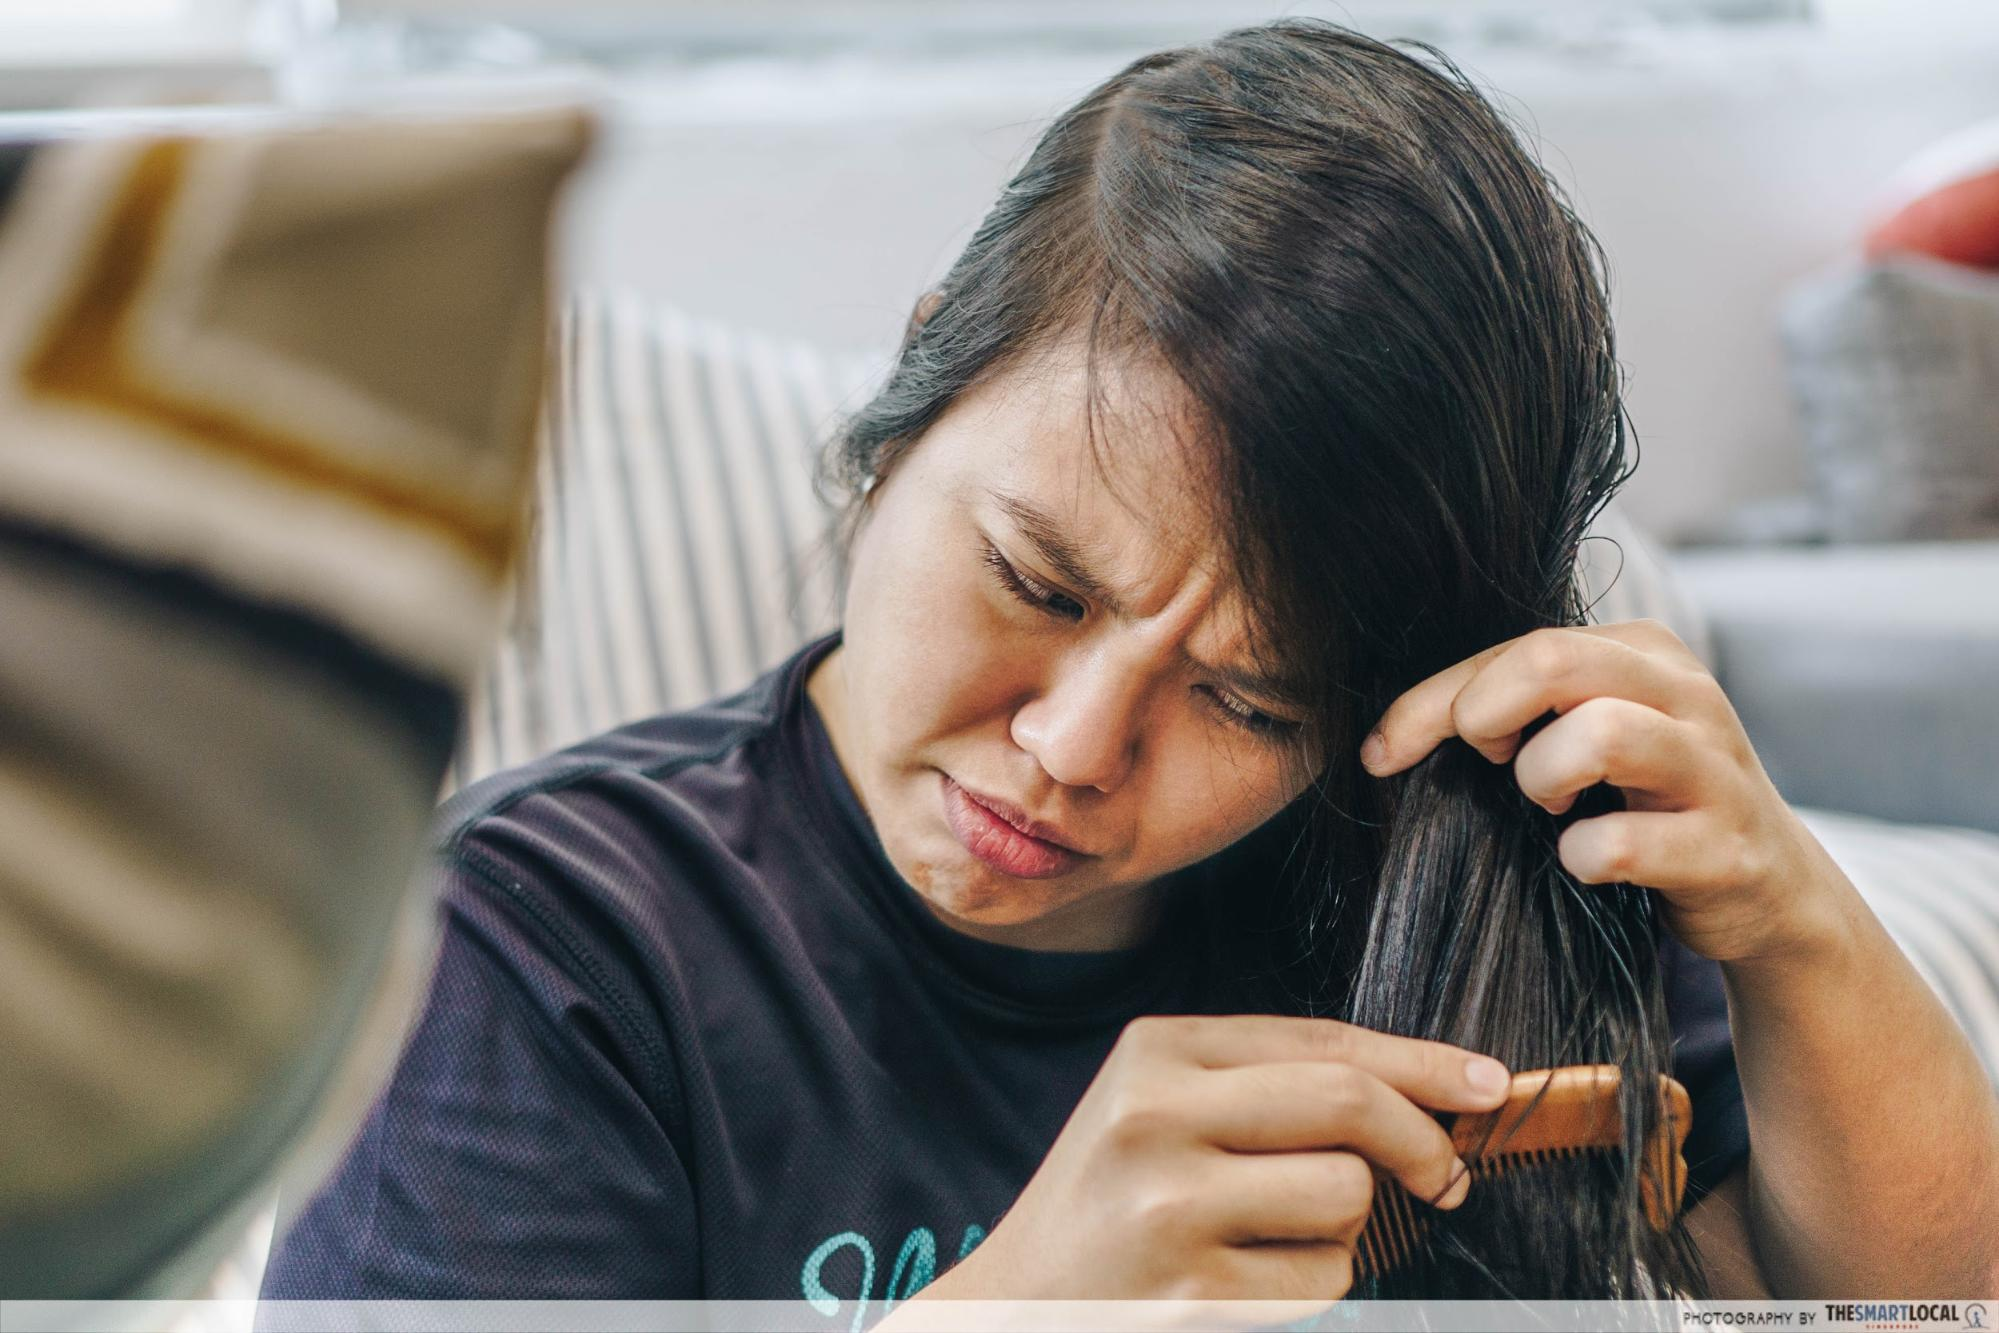 phs hairscience hair washing mistakes wet